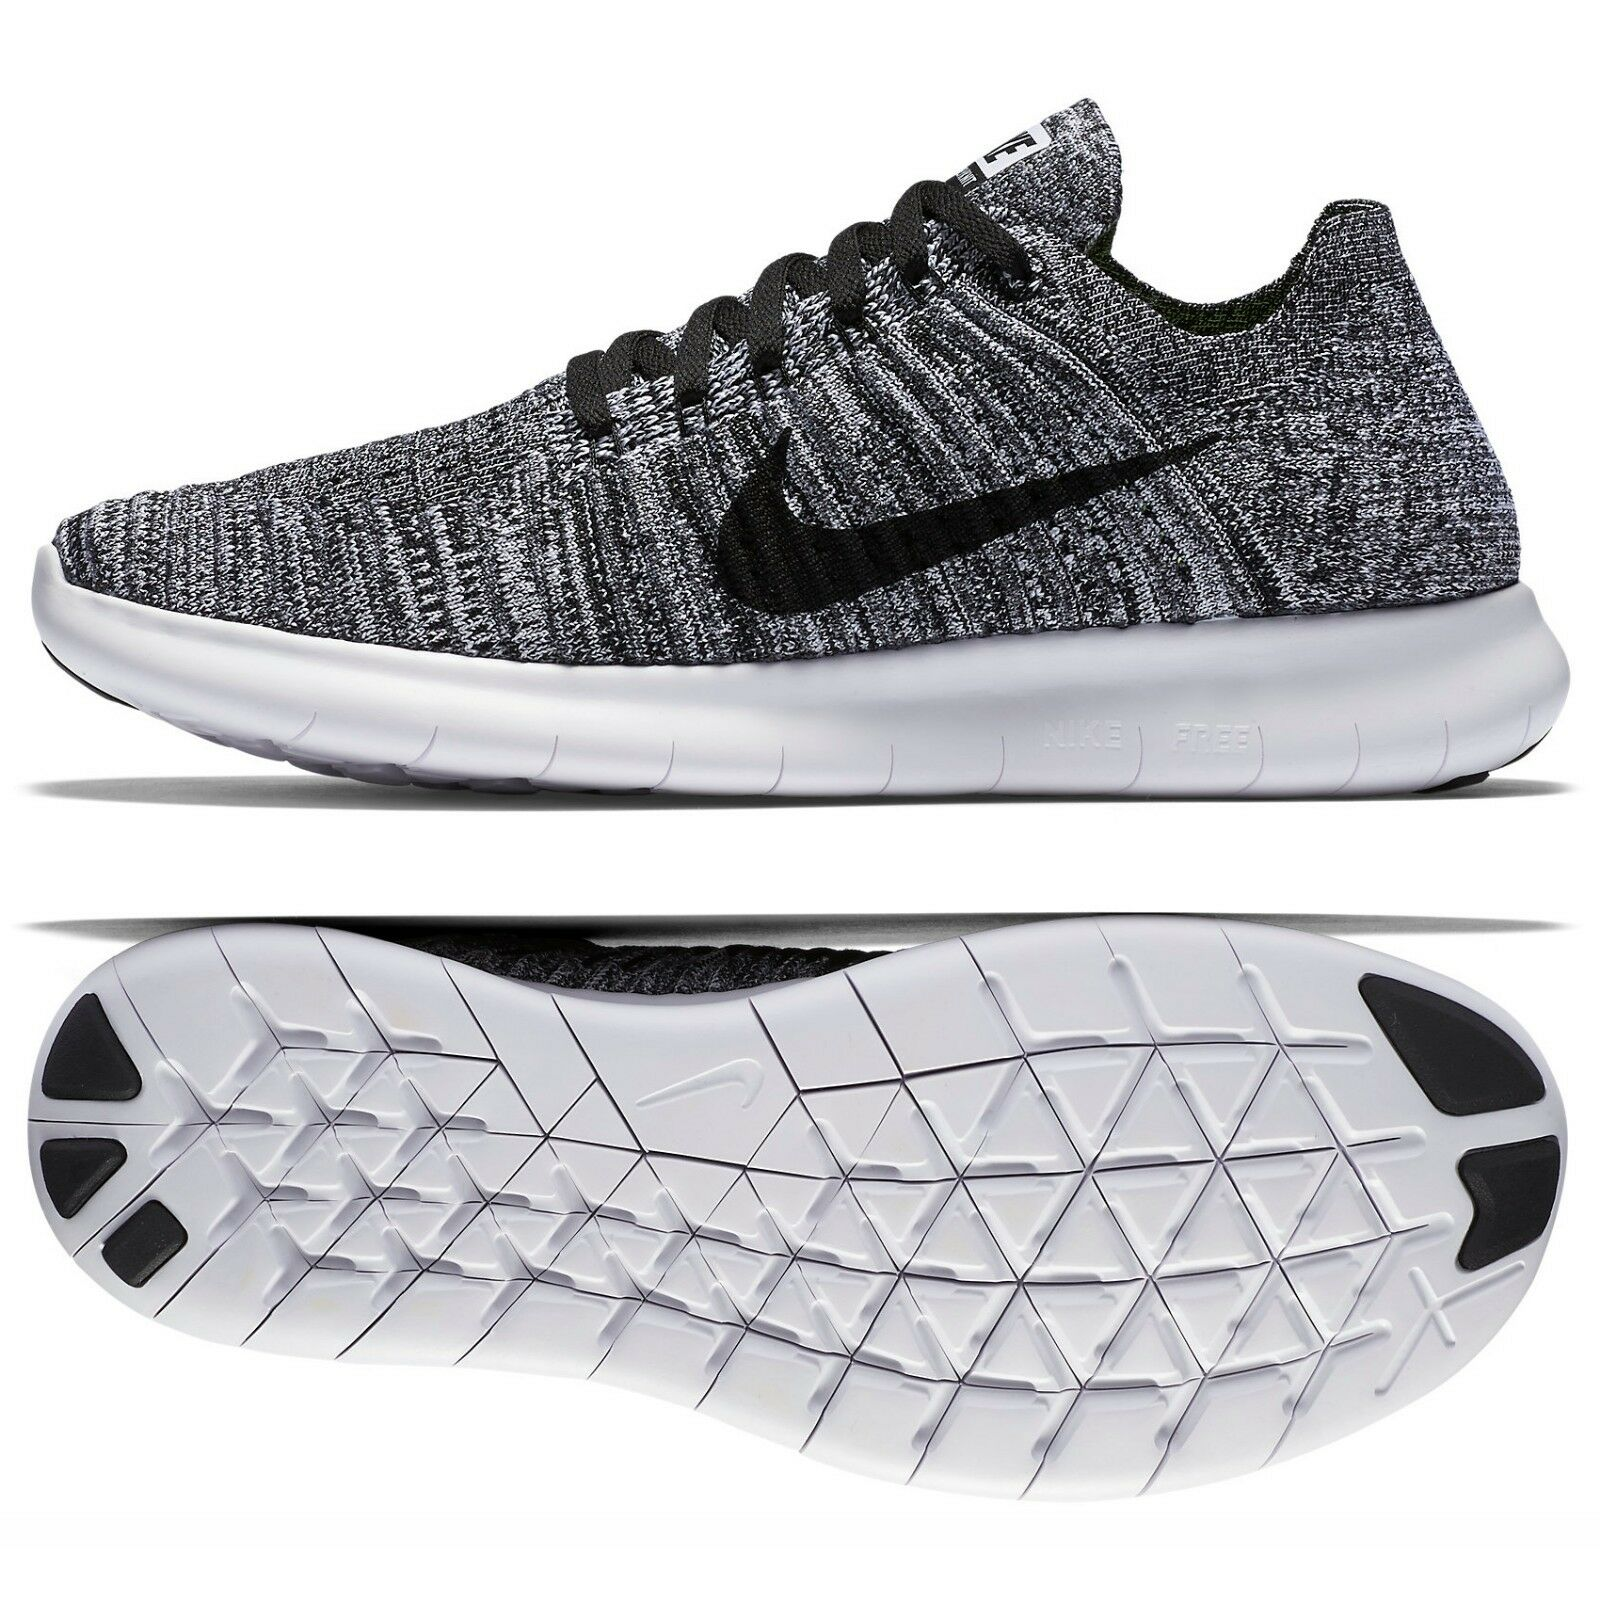 Nike WMNS Free RN Flyknit Oreo 831070-100 White Black Women's Running shoes